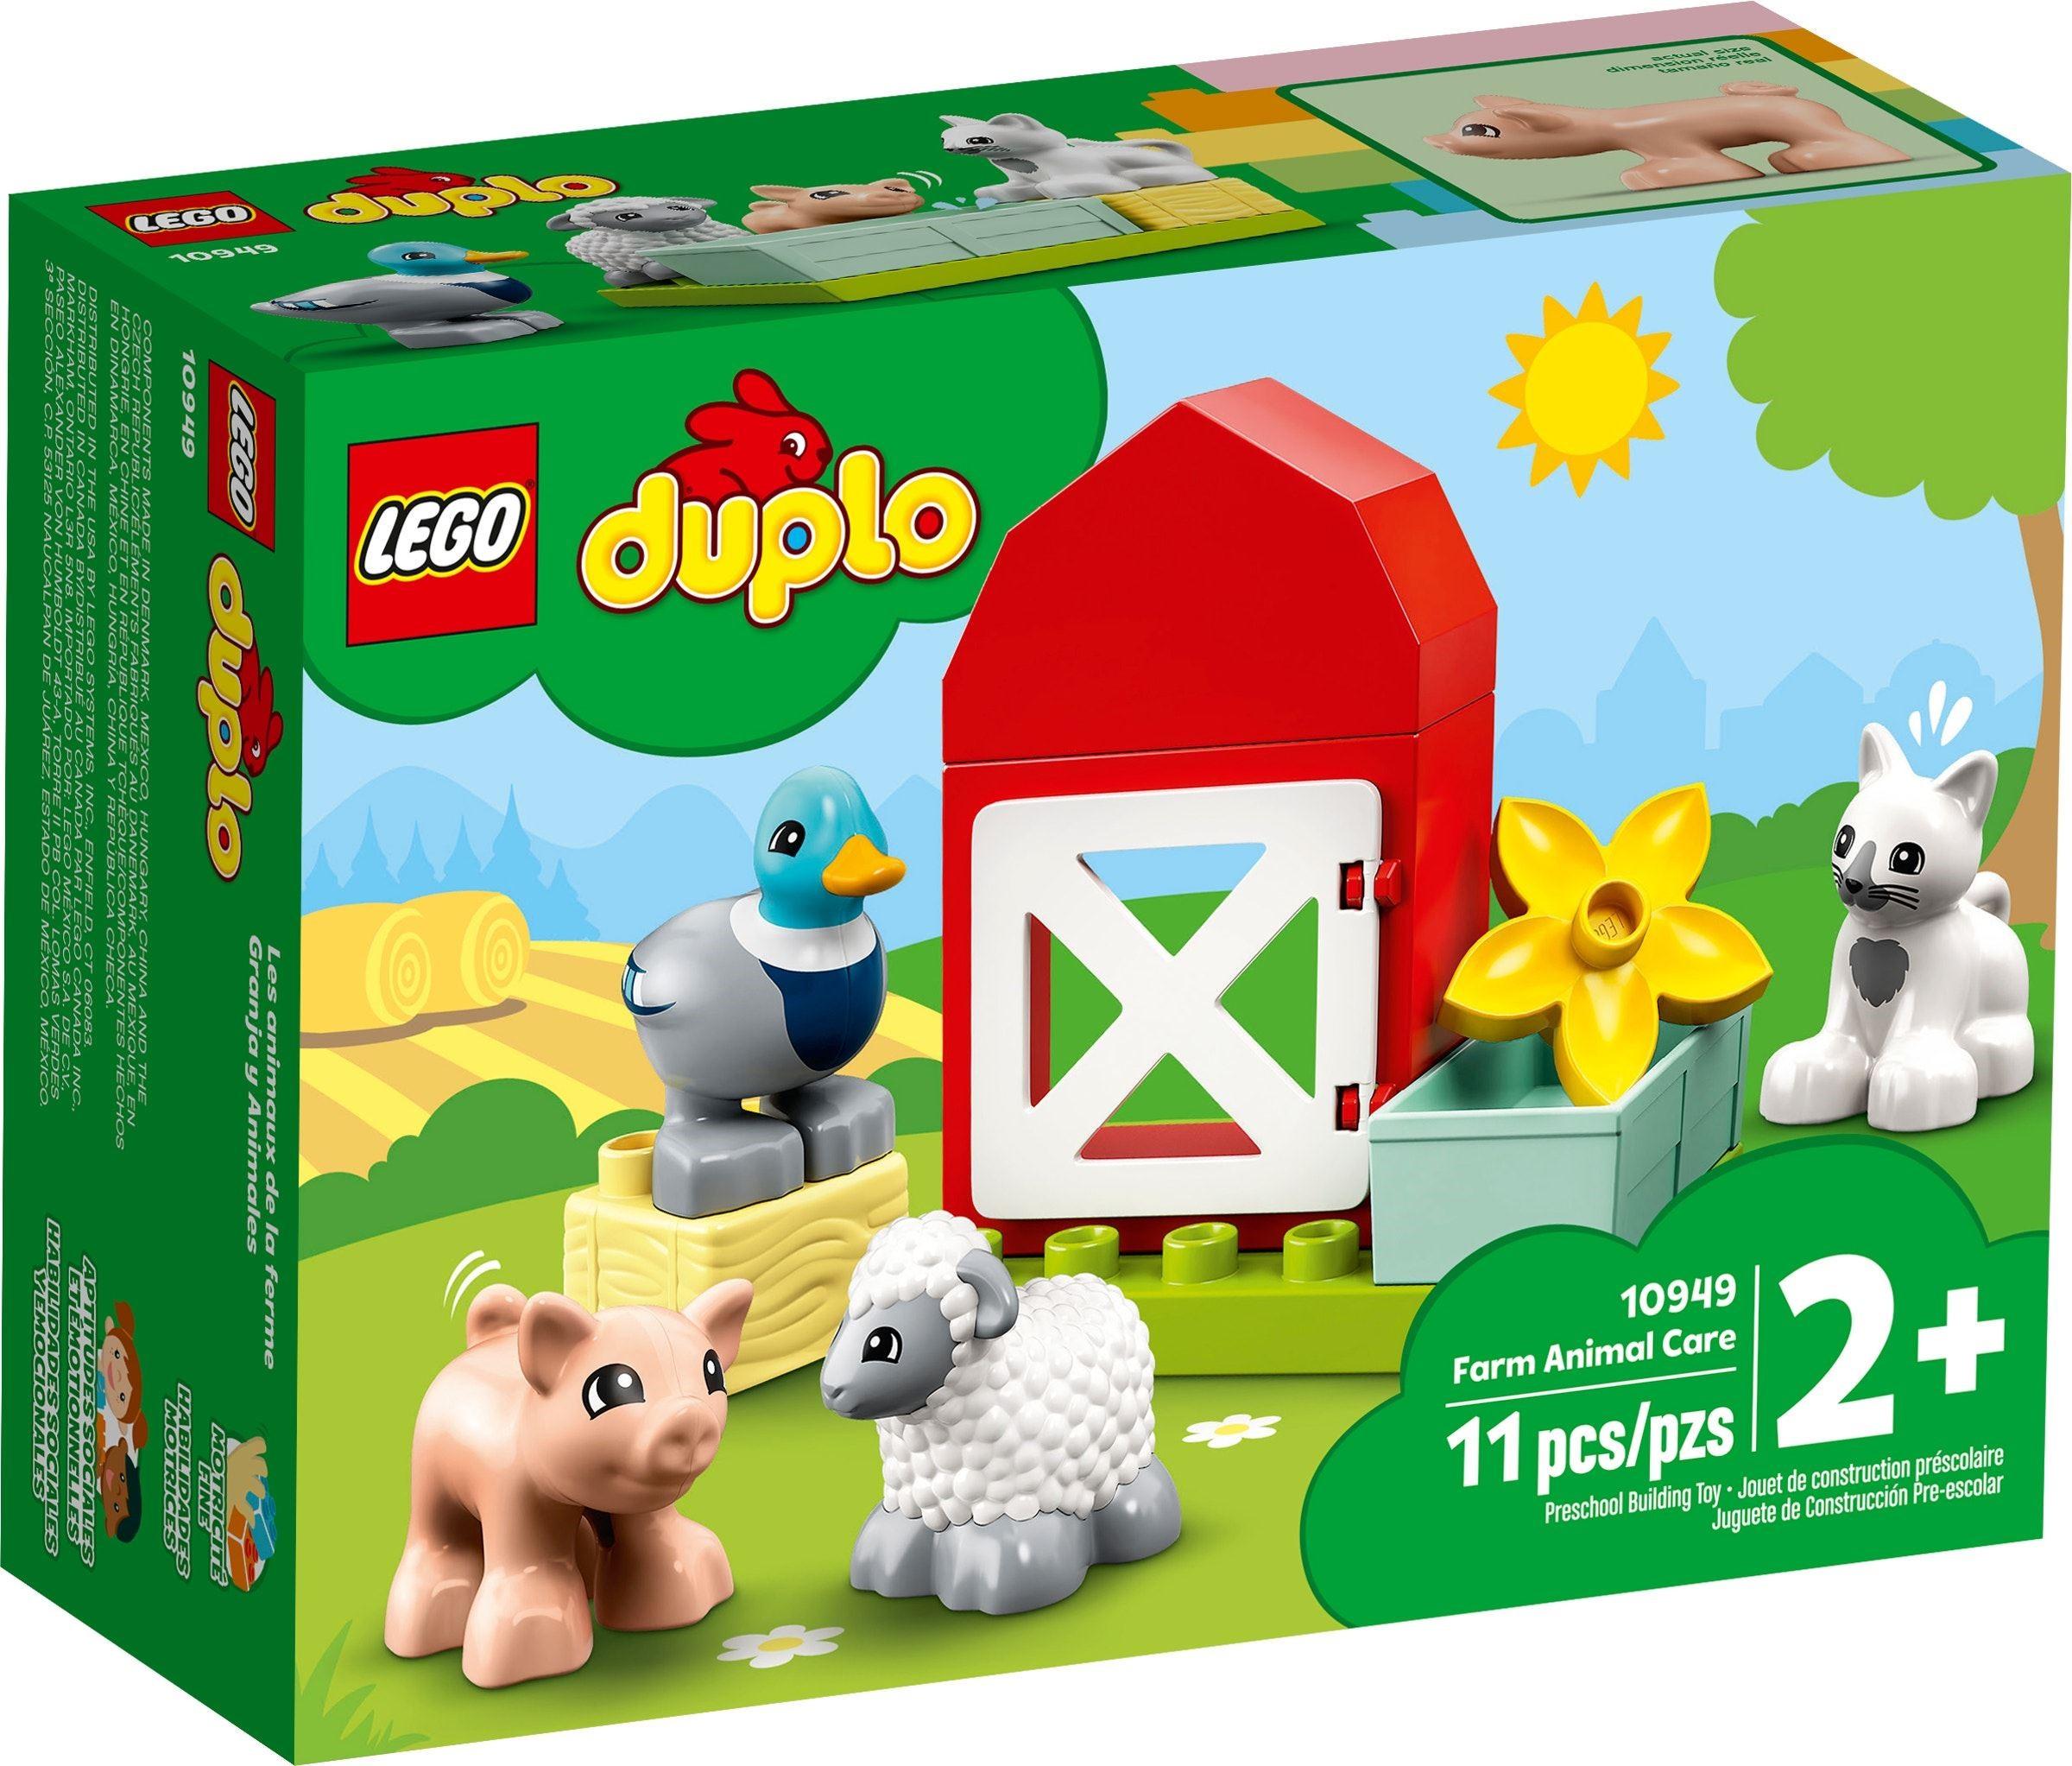 LEGO DUPLO - Farm Animal Care (10949)